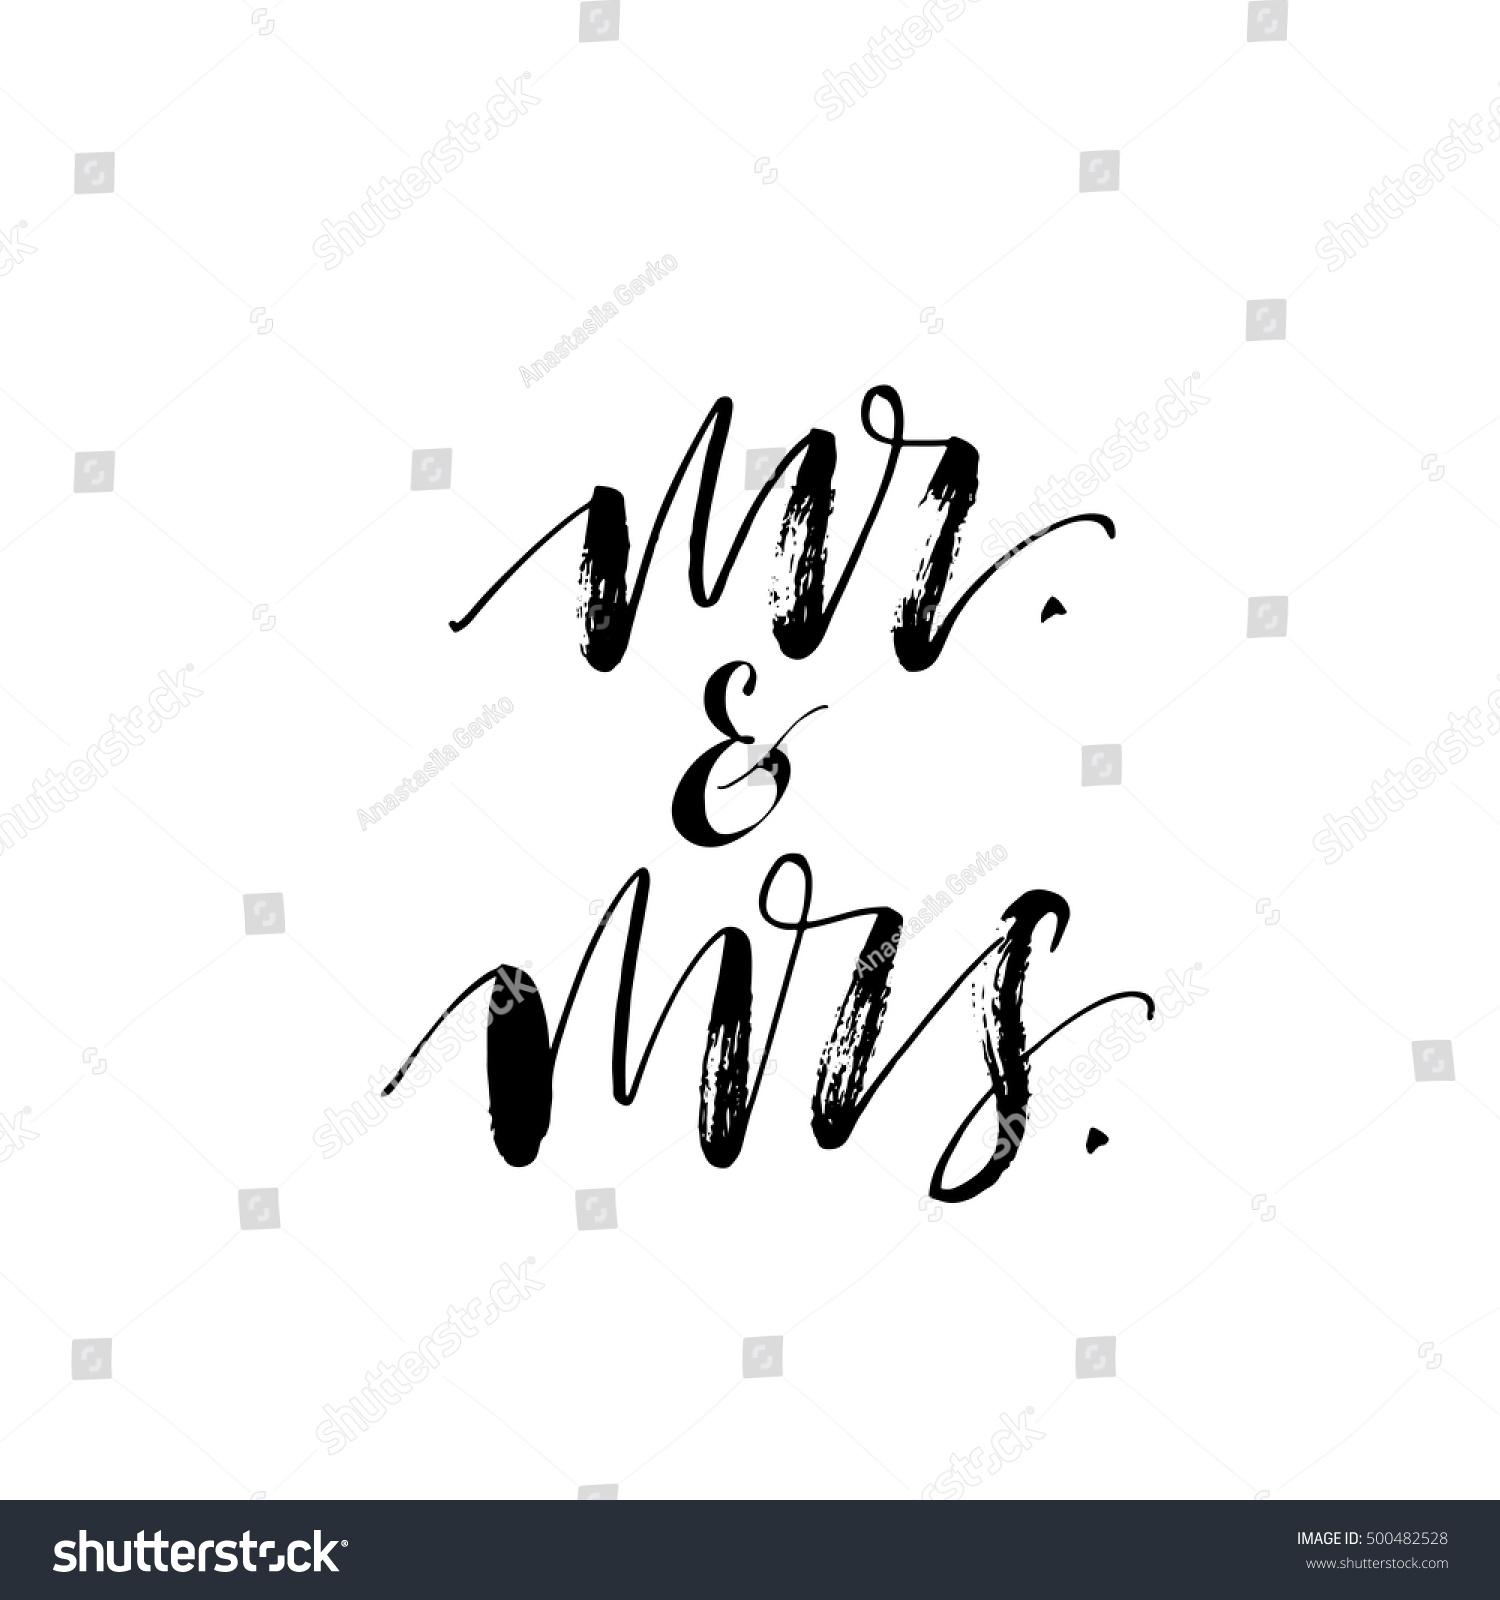 Mr mrs phrase hand drawn wedding stock vector